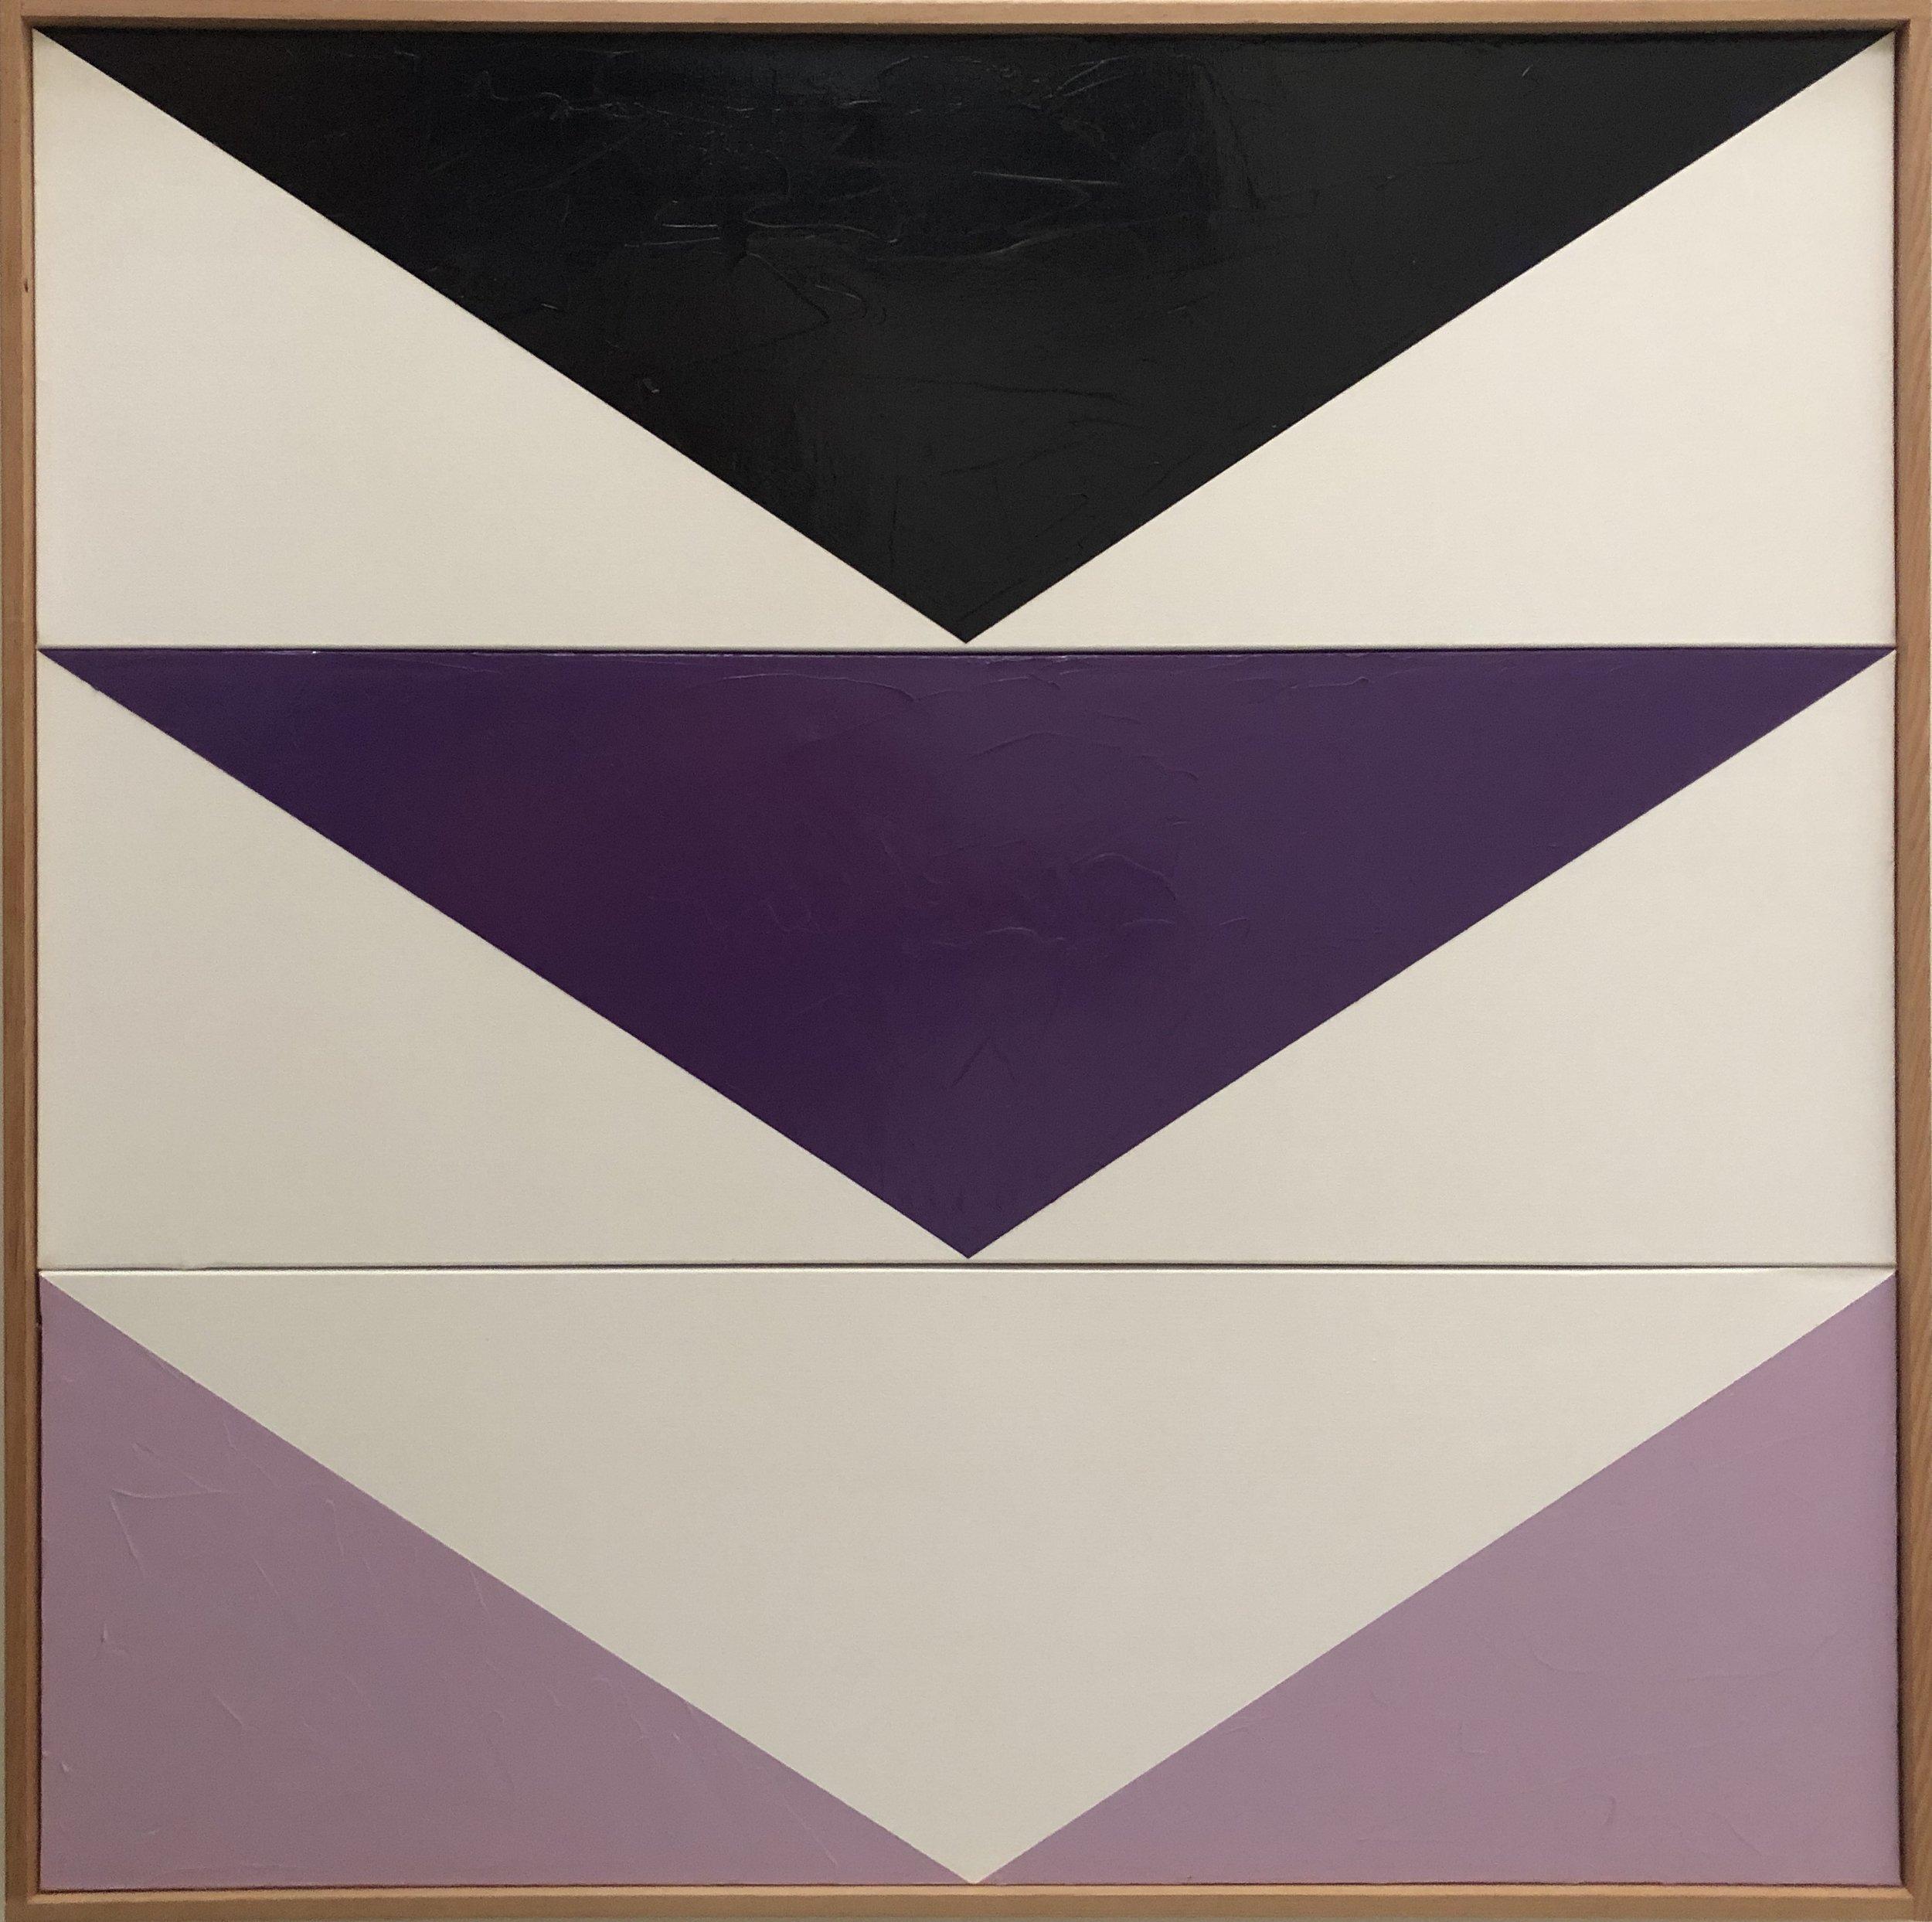 Purple Arrow Triptych JET0580 - Image 1.JPG